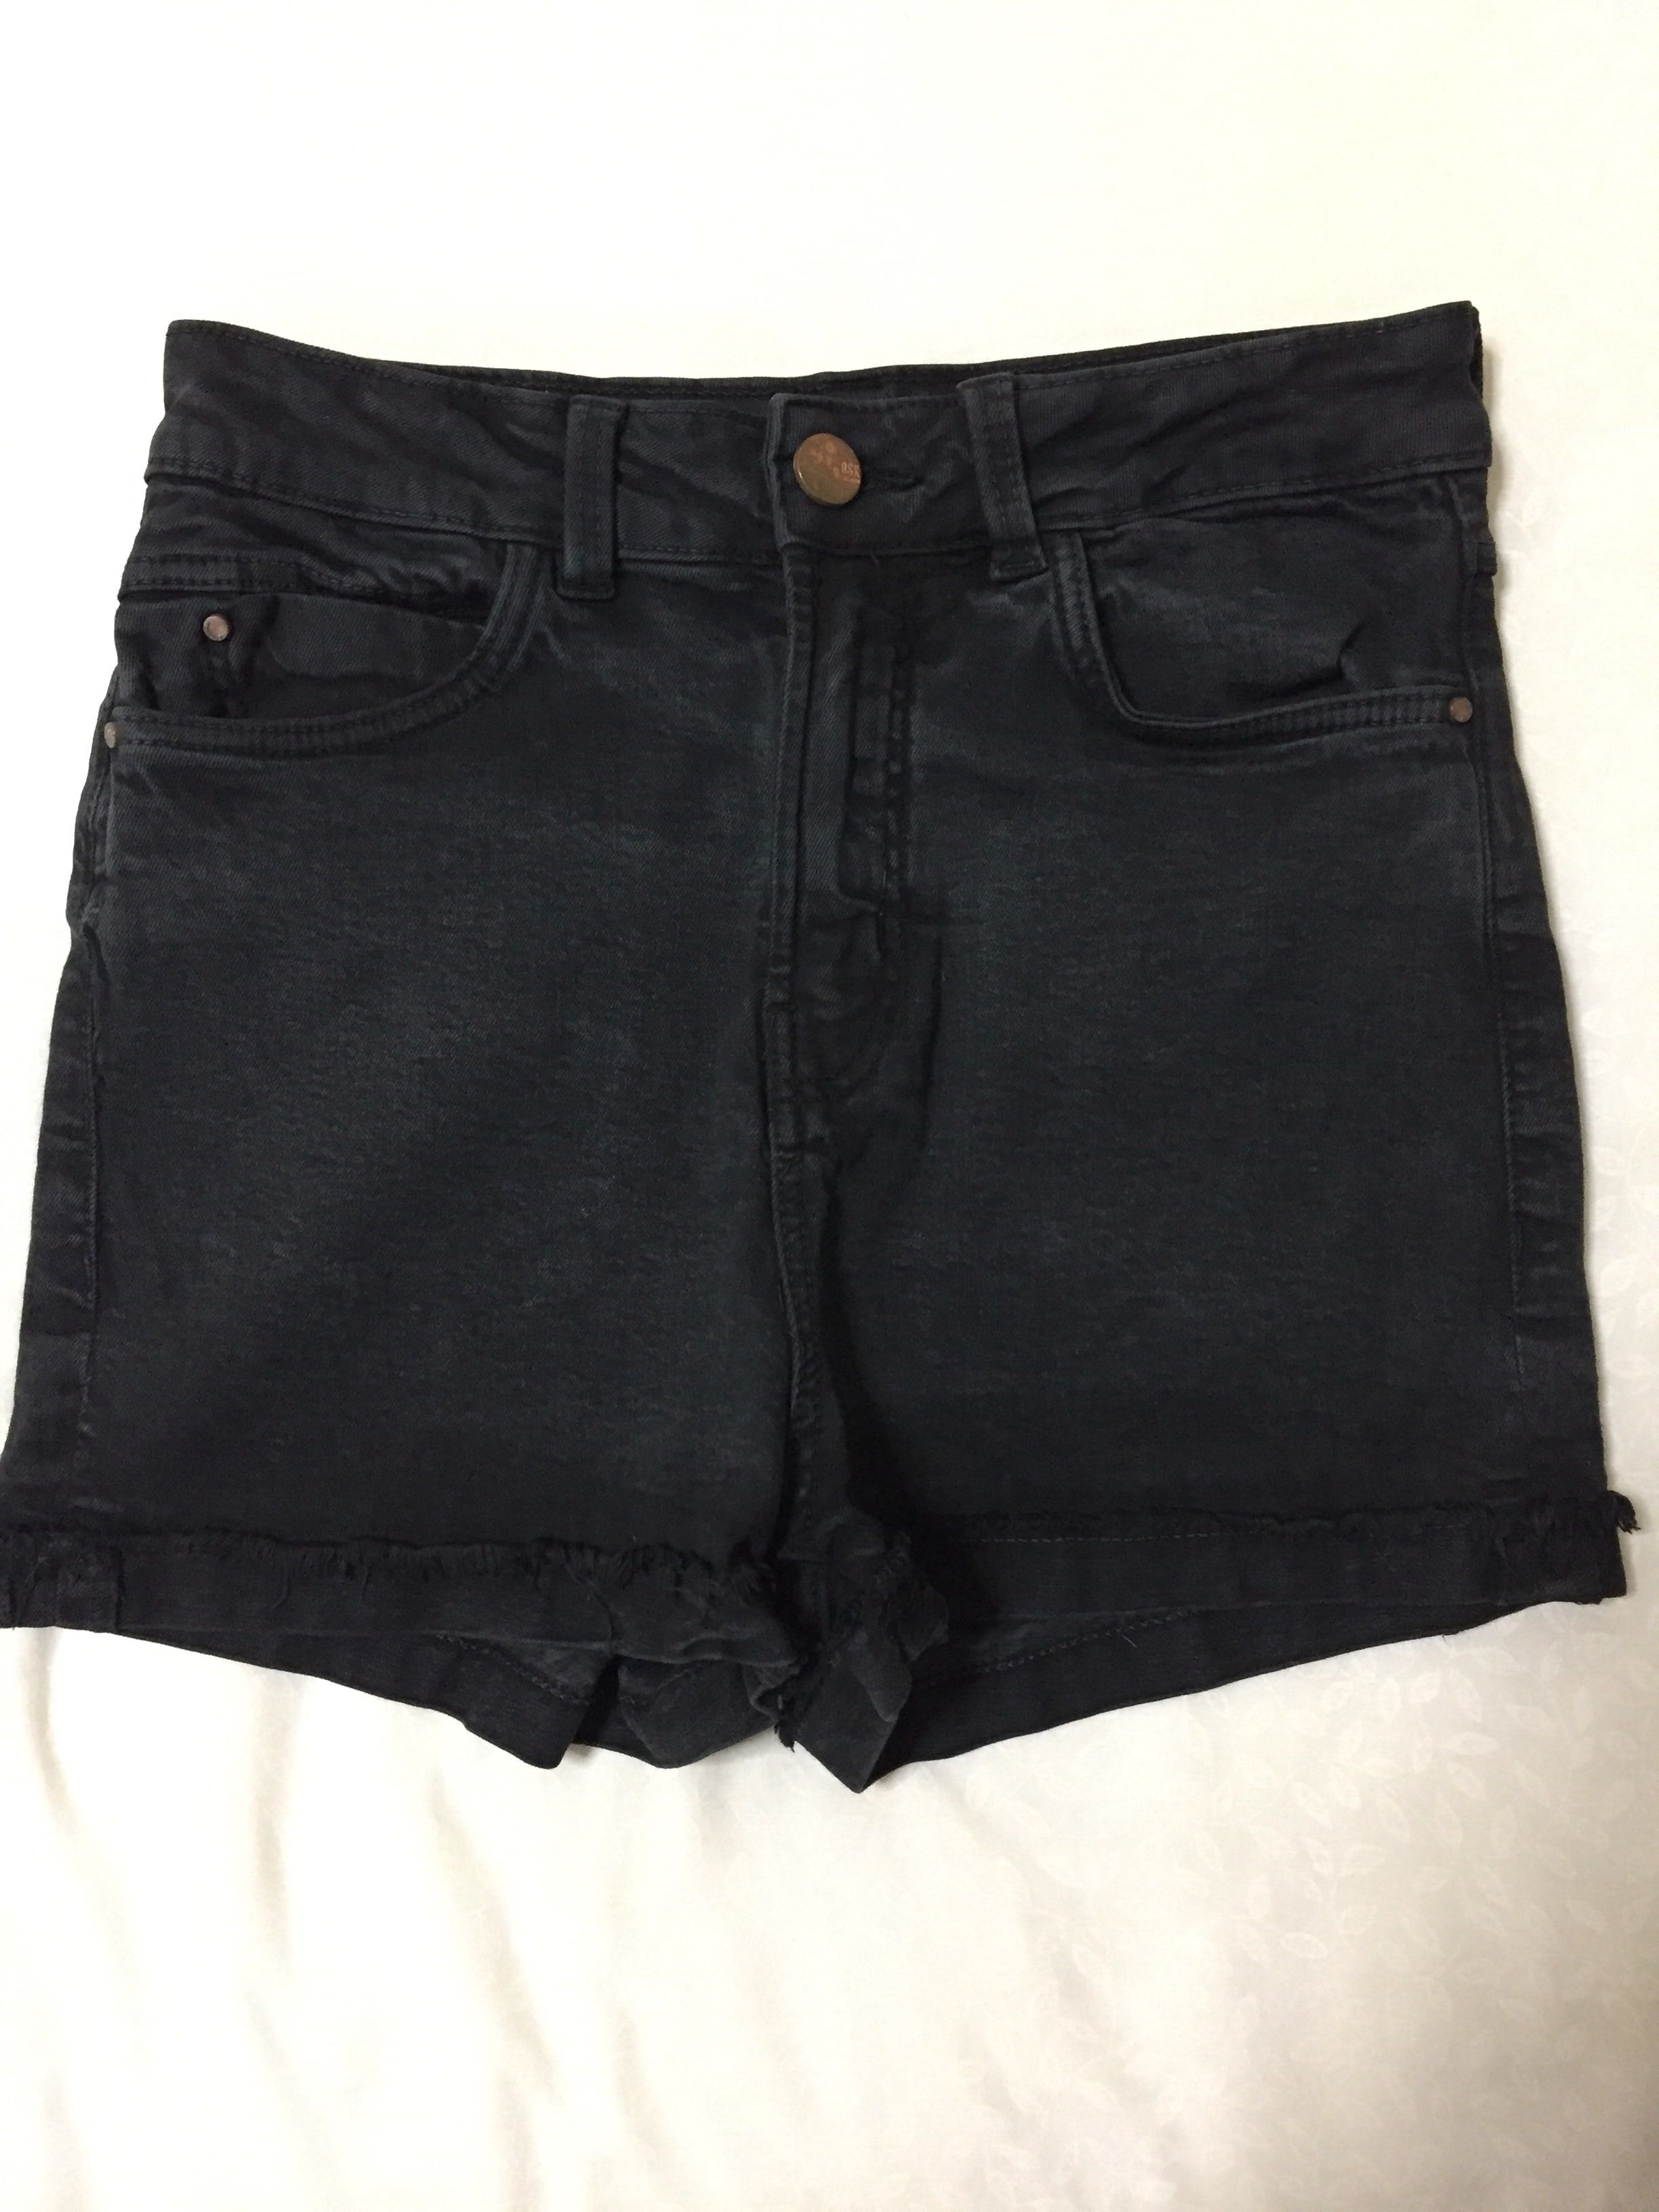 343c5619c4bf bershka black high waisted denim shorts, Women's Fashion, Clothes ...